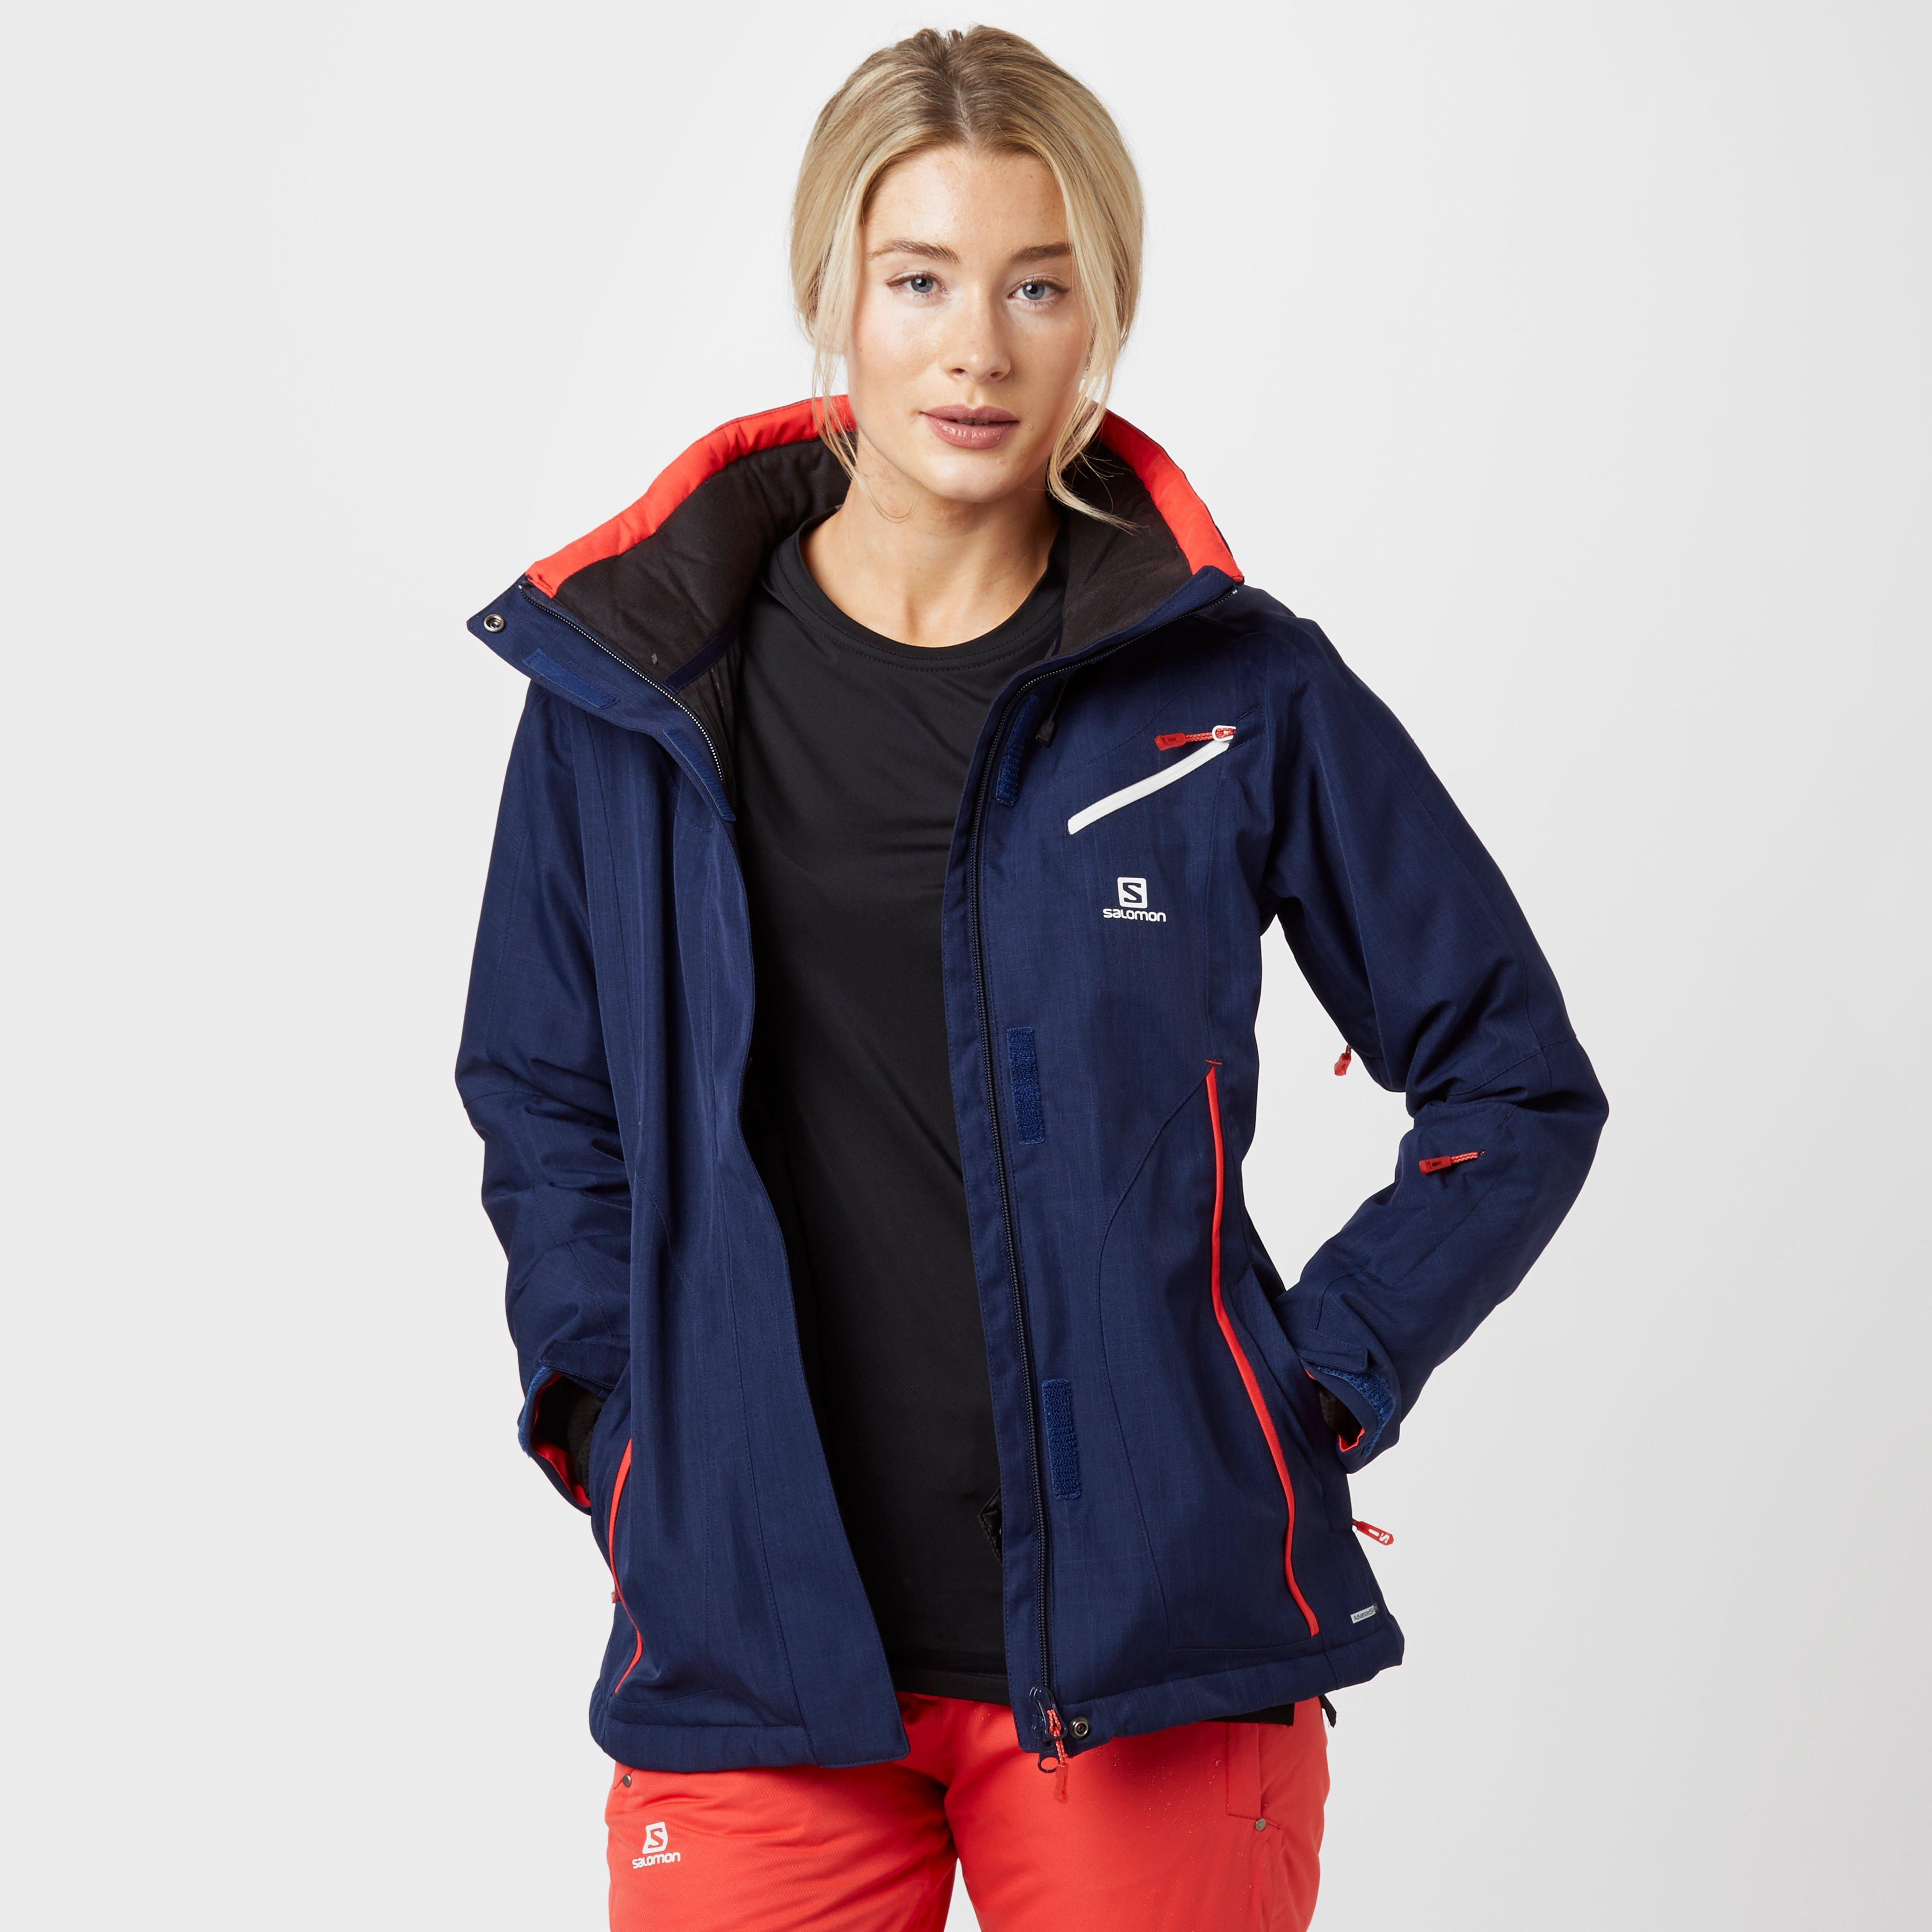 Salomon ski jacket fantasy